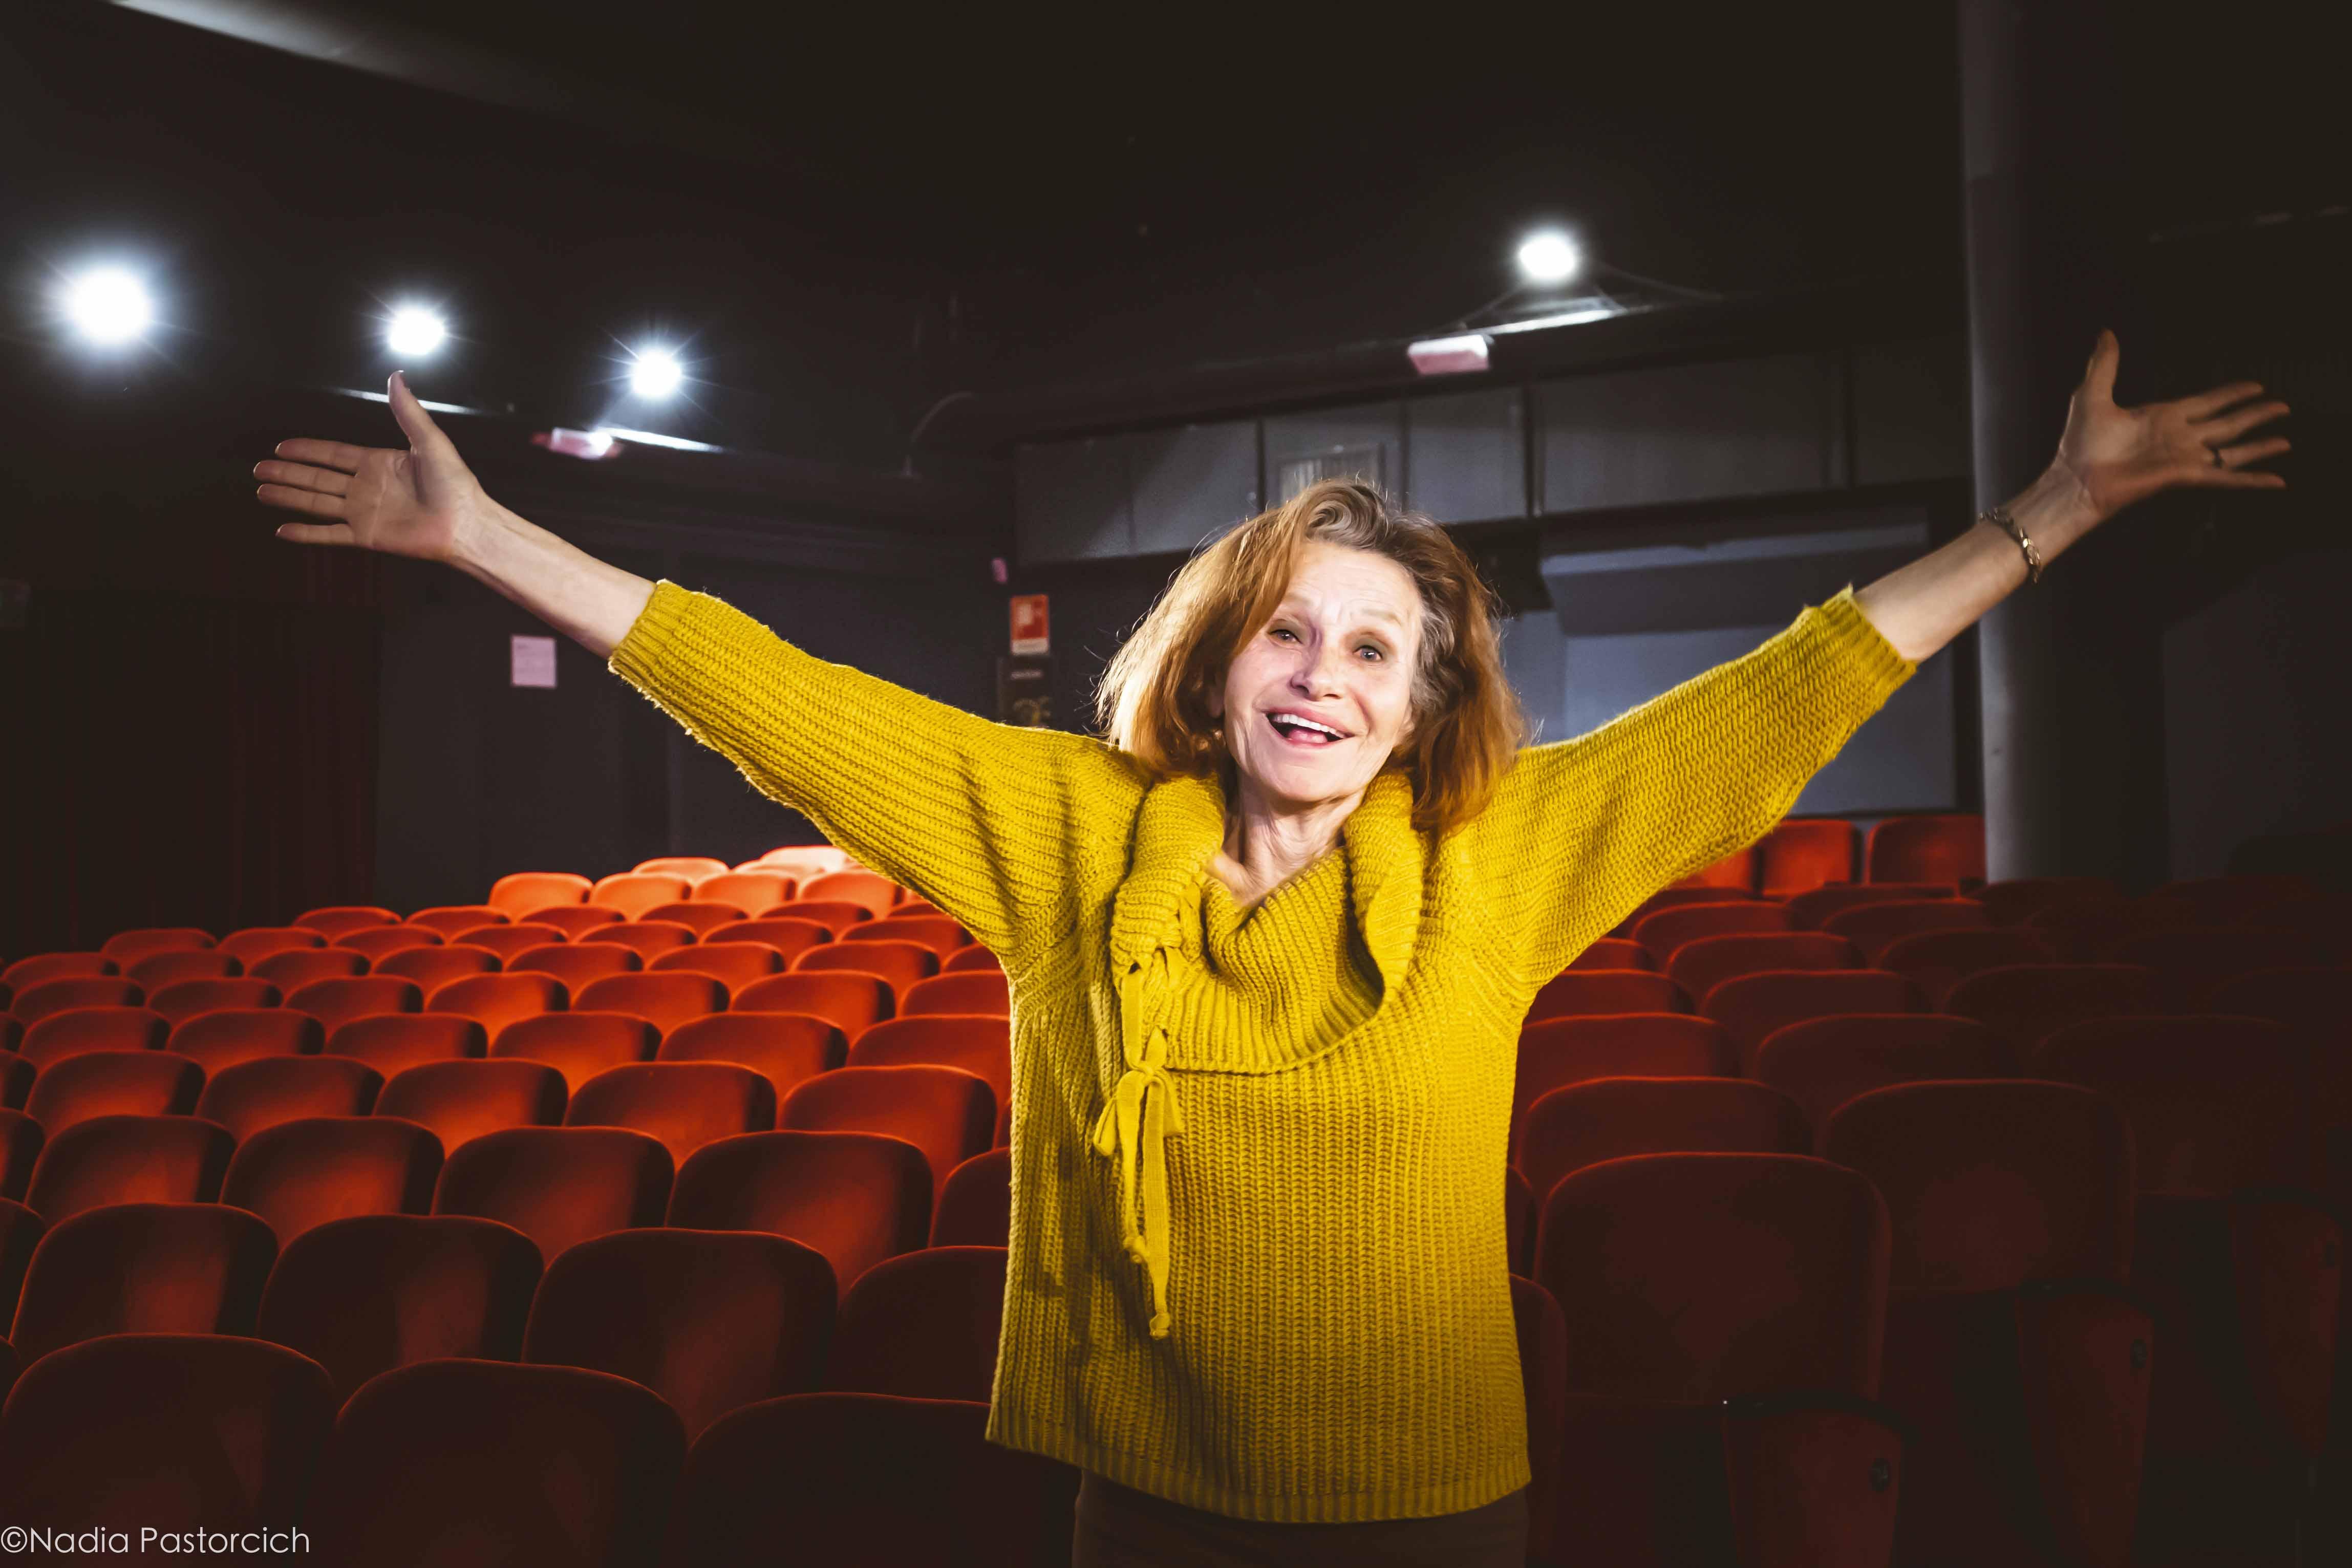 Erica Blanc: Entusiasta della vita